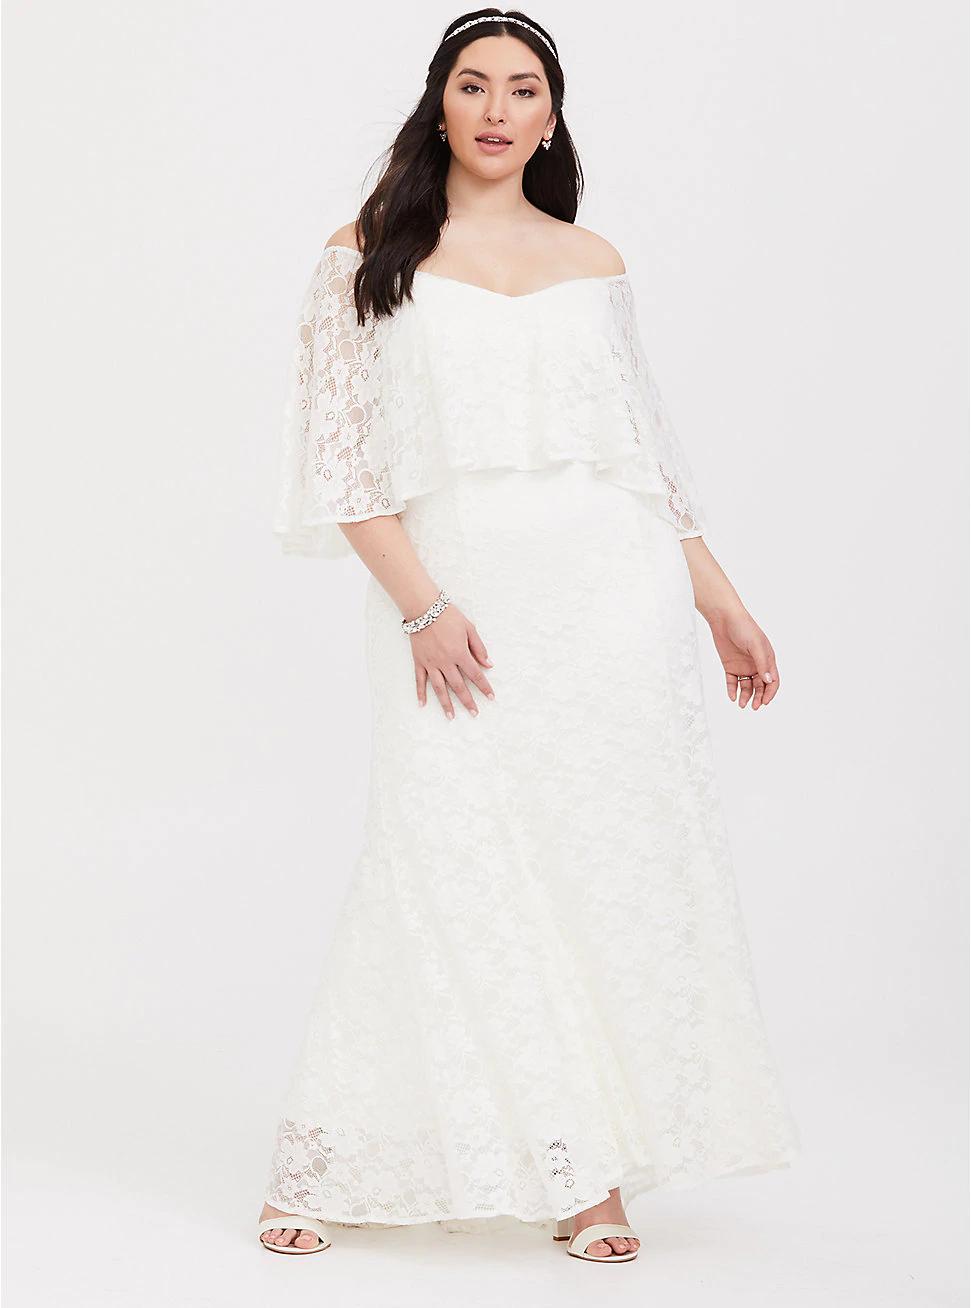 Pin By Regina Nicole On Someday Wedding Stretch Lace Dress Wedding Dress Capelet Floral Chiffon Maxi Dress [ 1308 x 971 Pixel ]